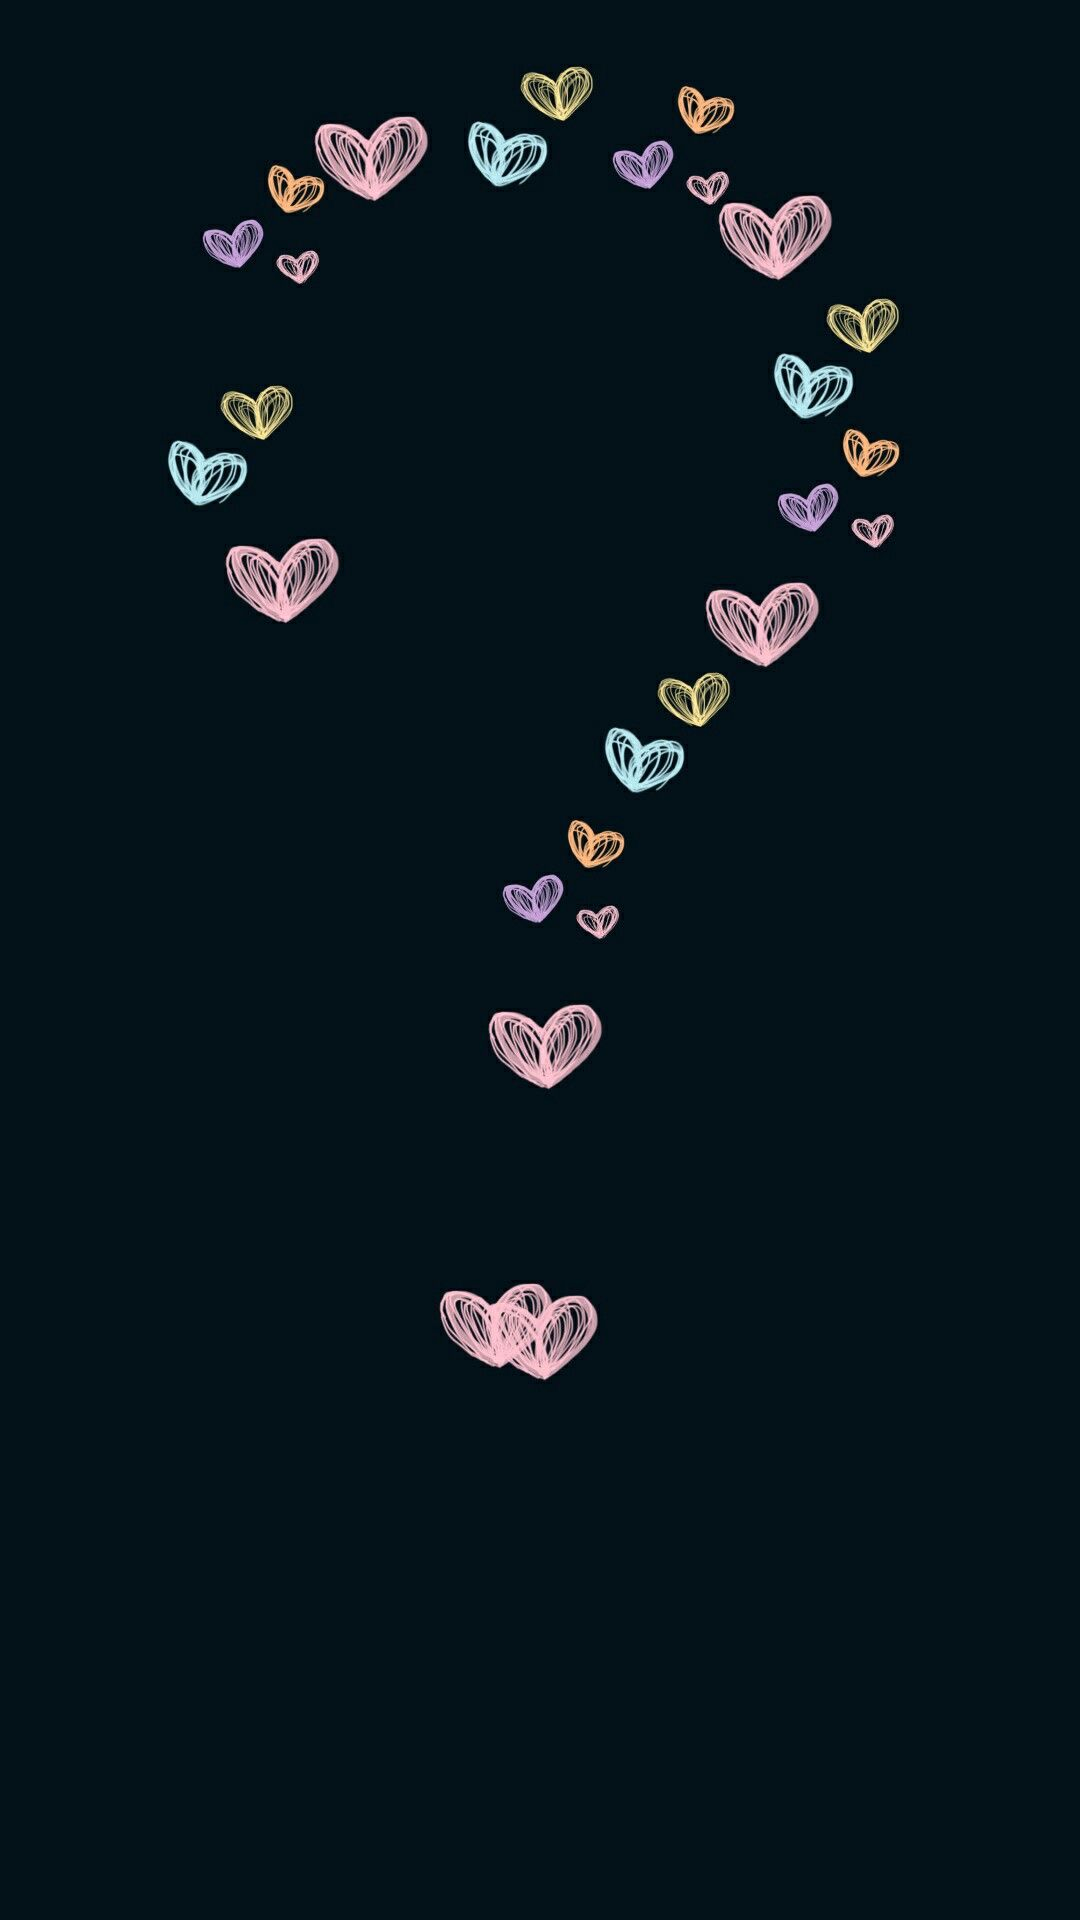 Heart ♡ ♡ ♡ *Sawaal bi kithni  Thithiliyonse Bari PADI. Udneki umang-kamoshnyon K mijaaj lerakhi janaab.....